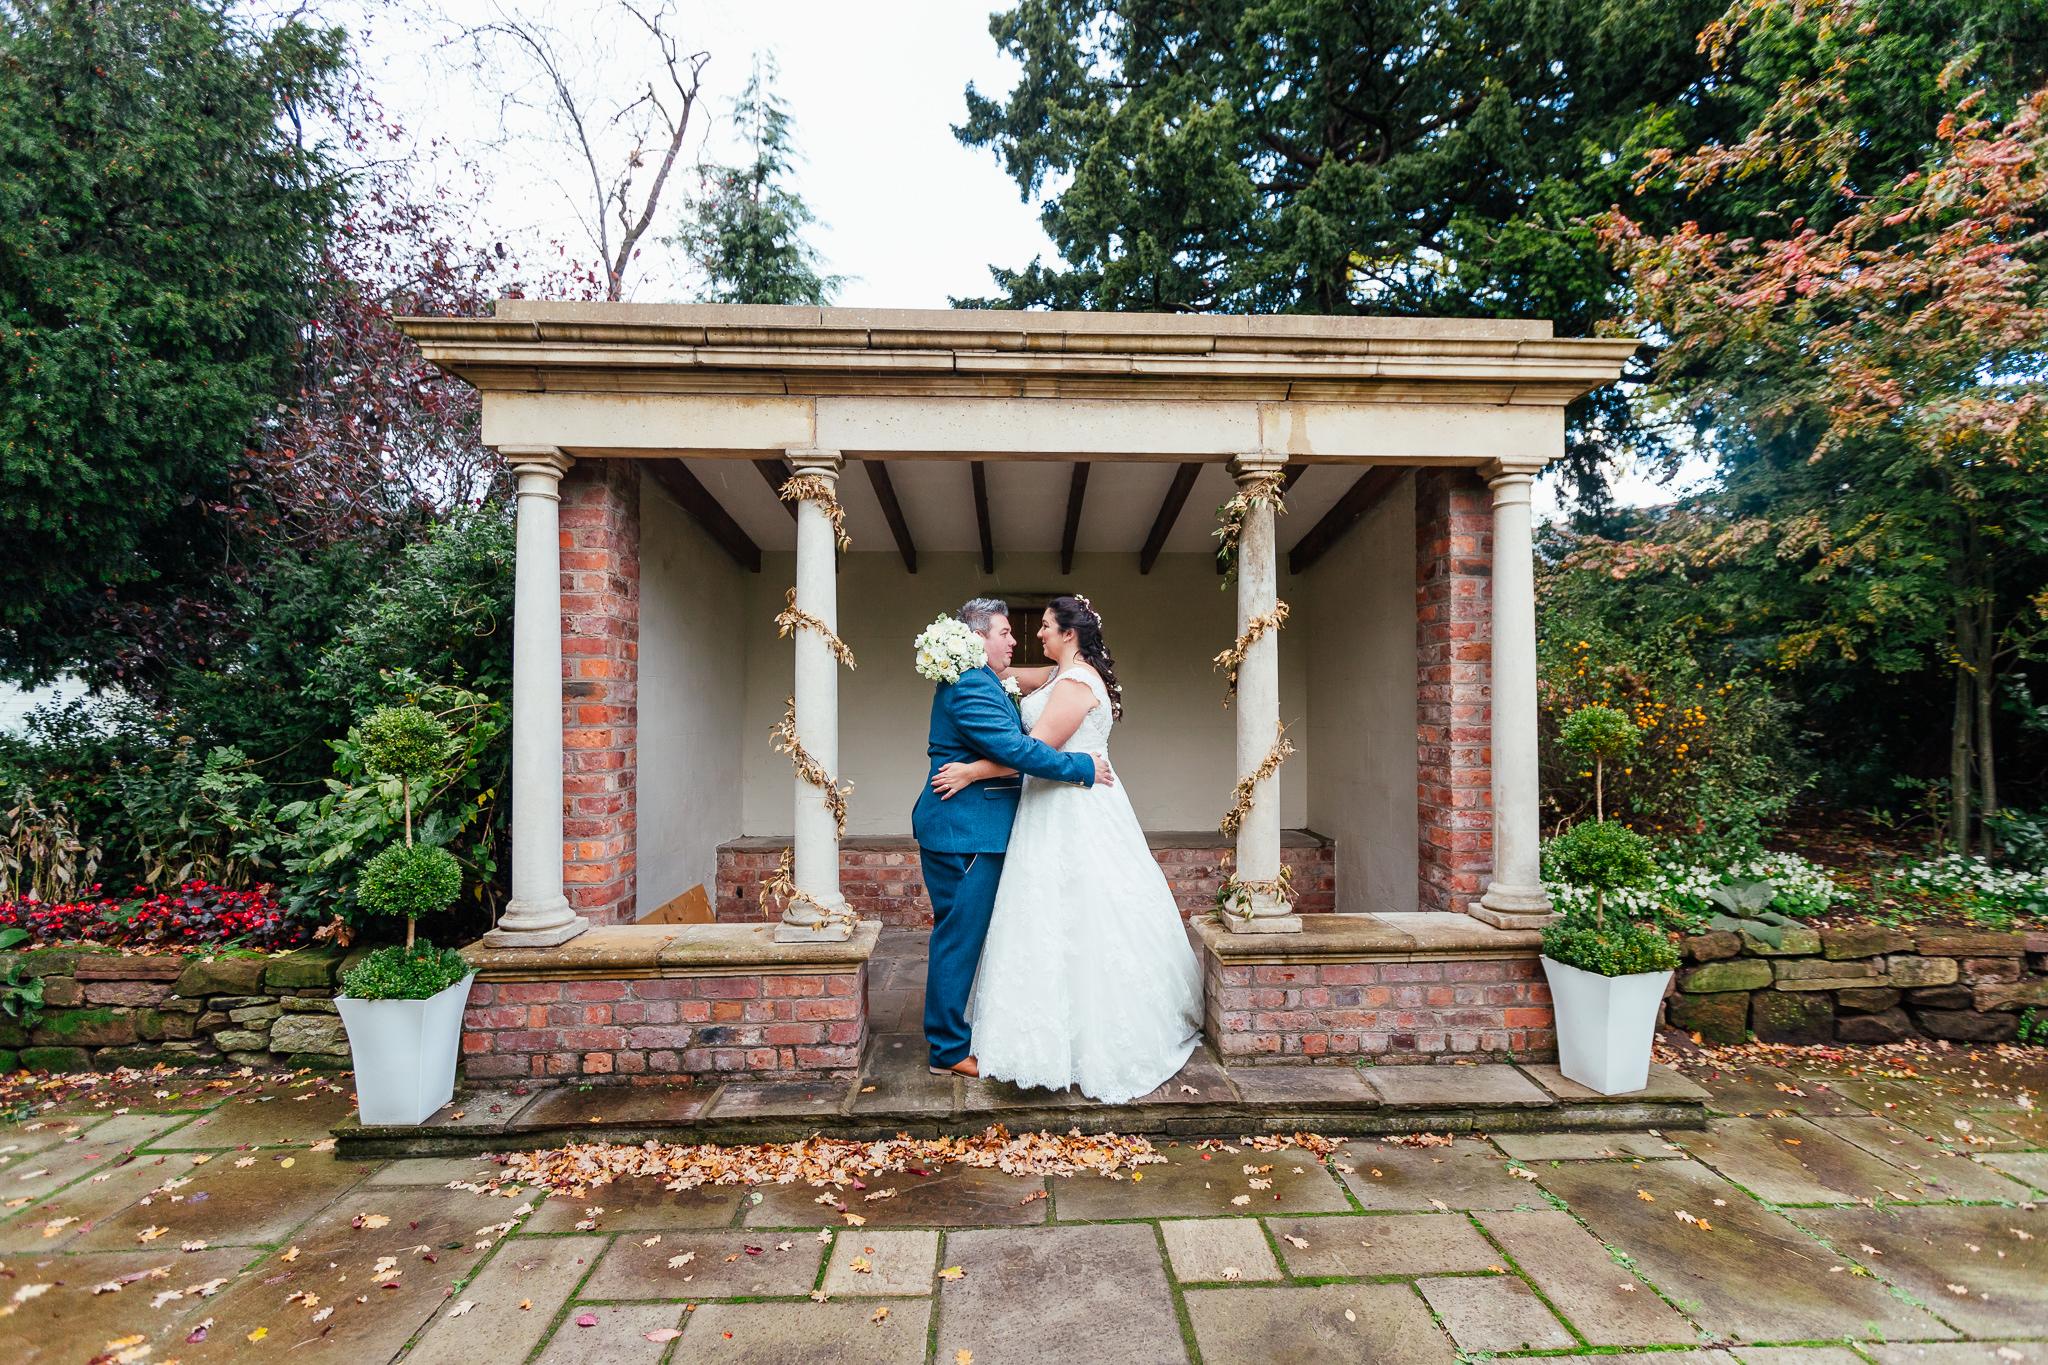 Willington-Hall-Cheshire-Wedding-26.jpg